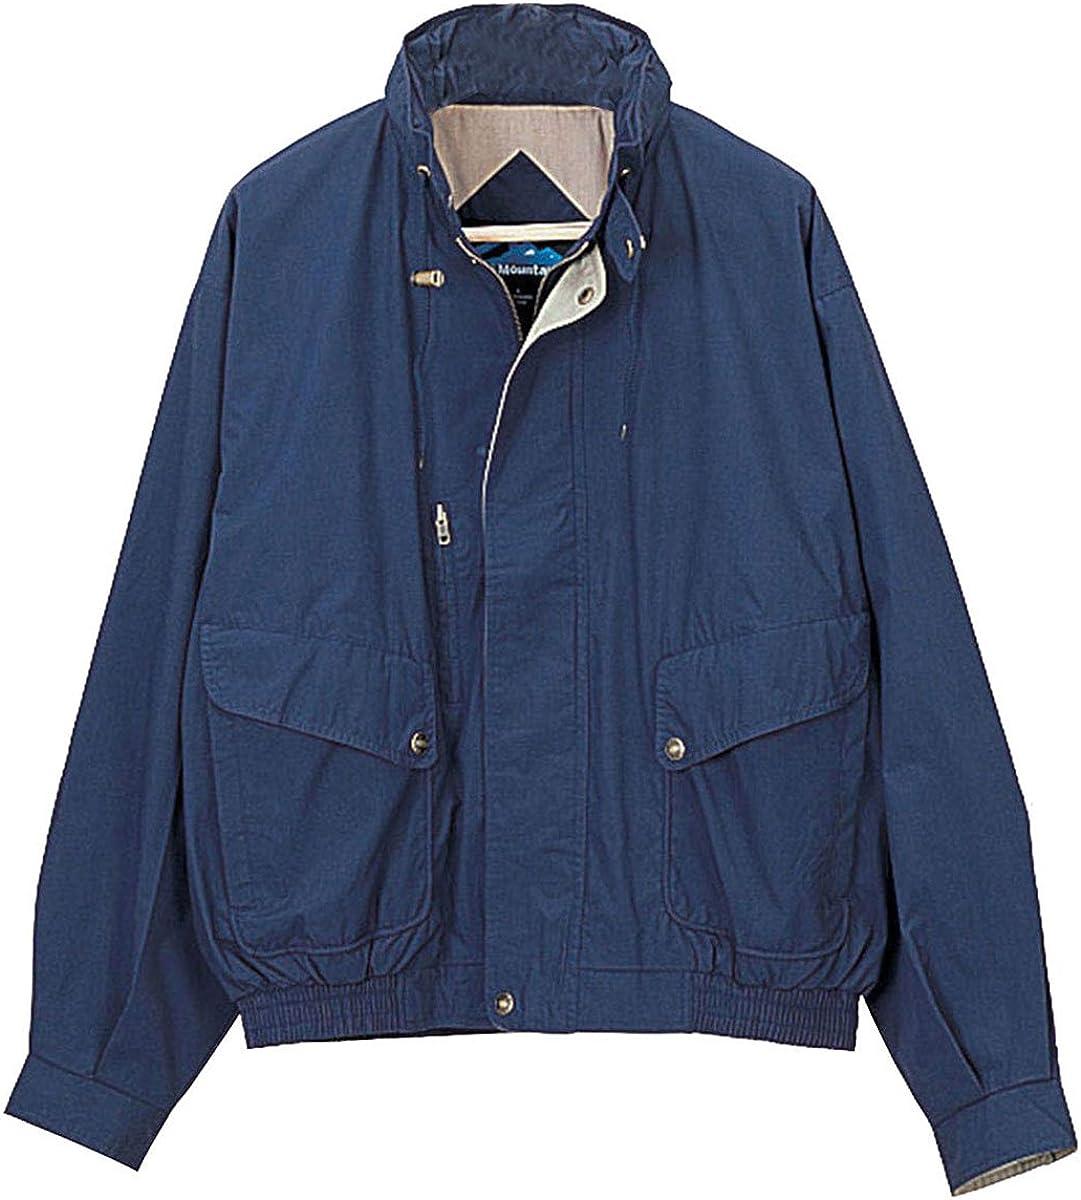 Tri-Mountain Men's Water Resistant Poplin Jacket, Navy / Khaki XXX-Large